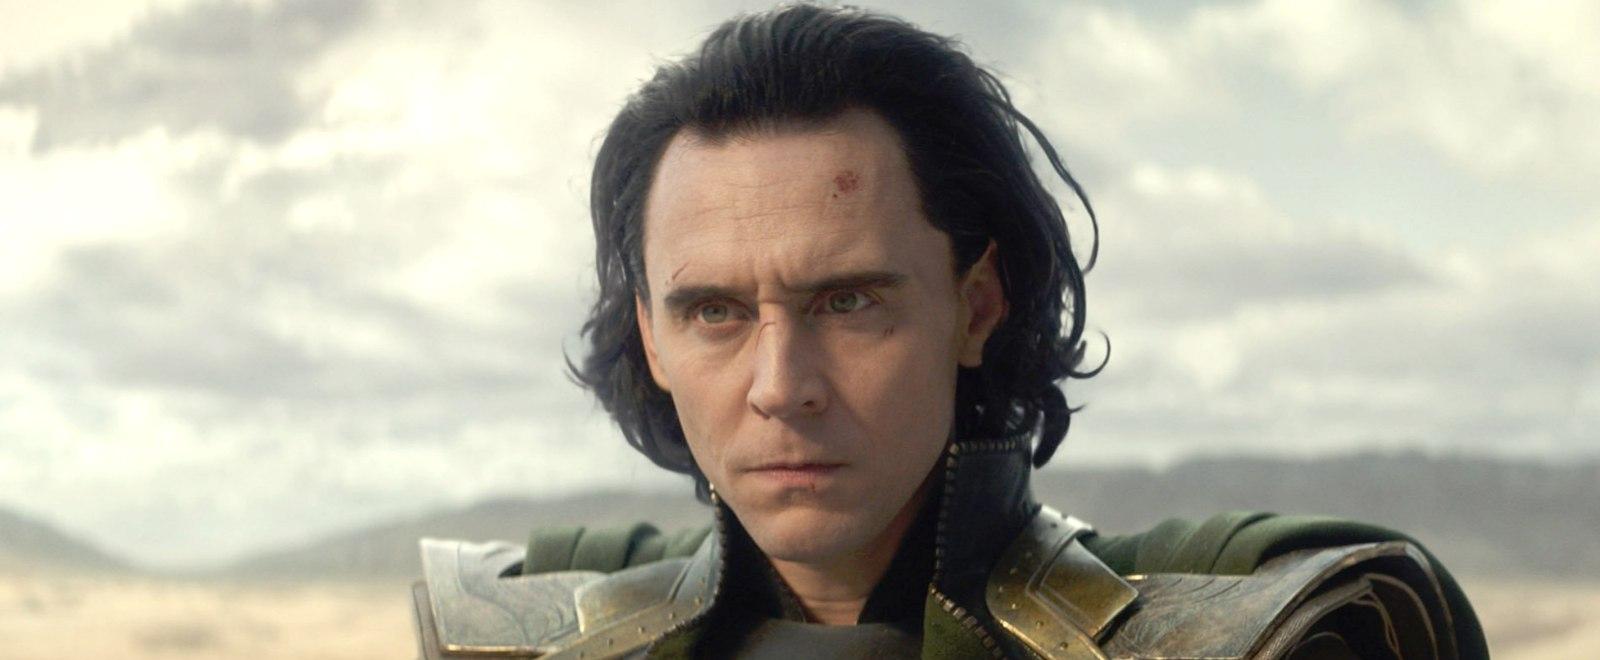 The 'Loki' Season Finale Introduced The Next Big Bad Of The MCU